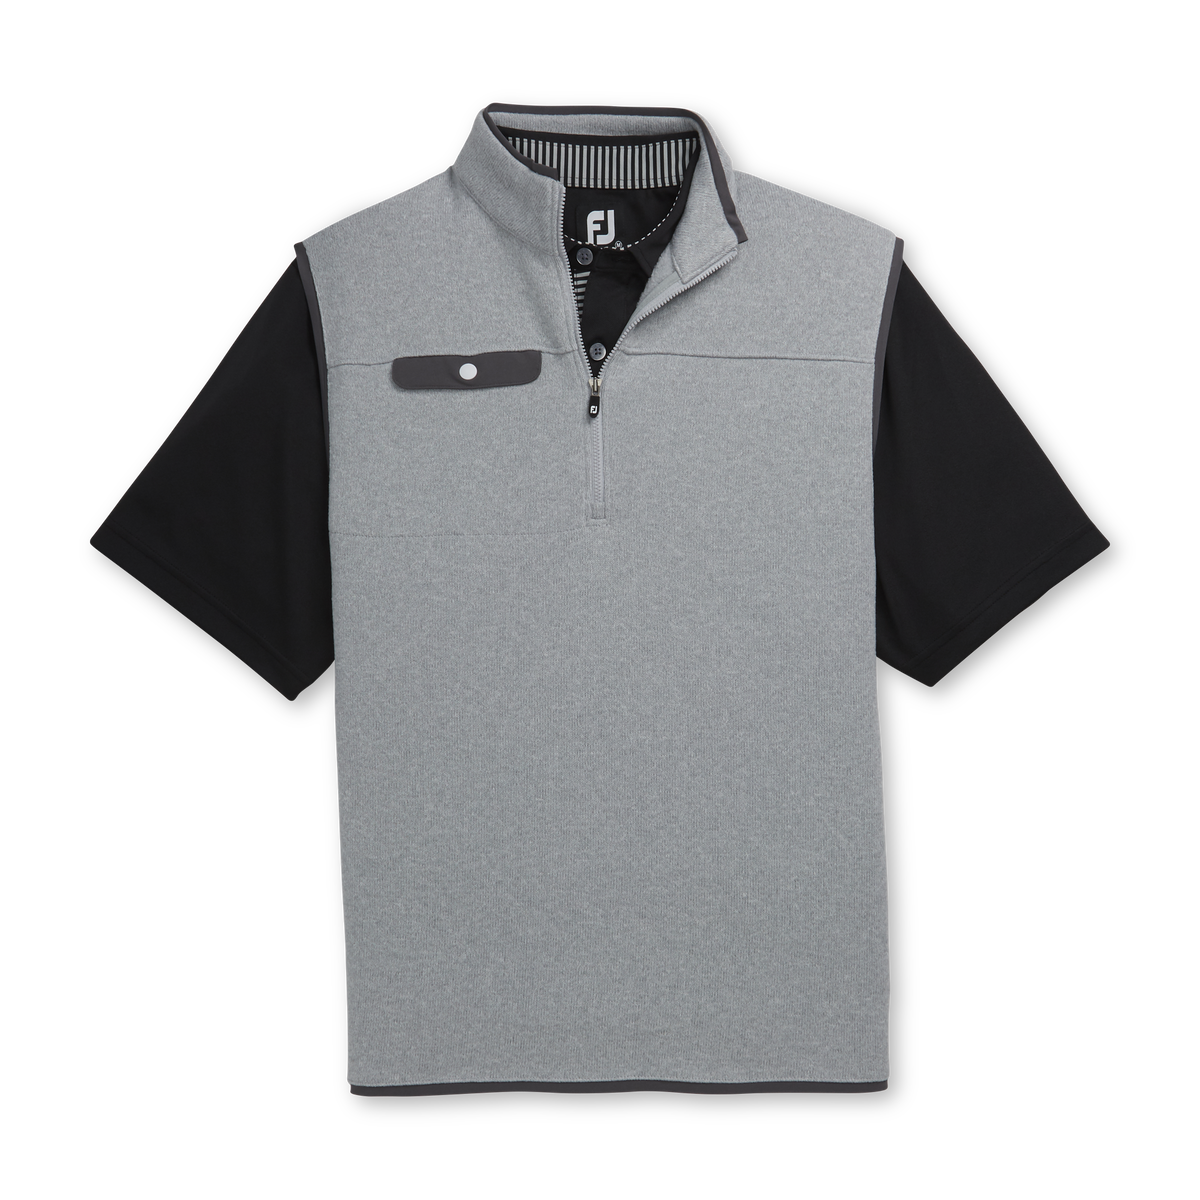 Sweater Fleece Quarter-Zip Vest-Previous Season Style